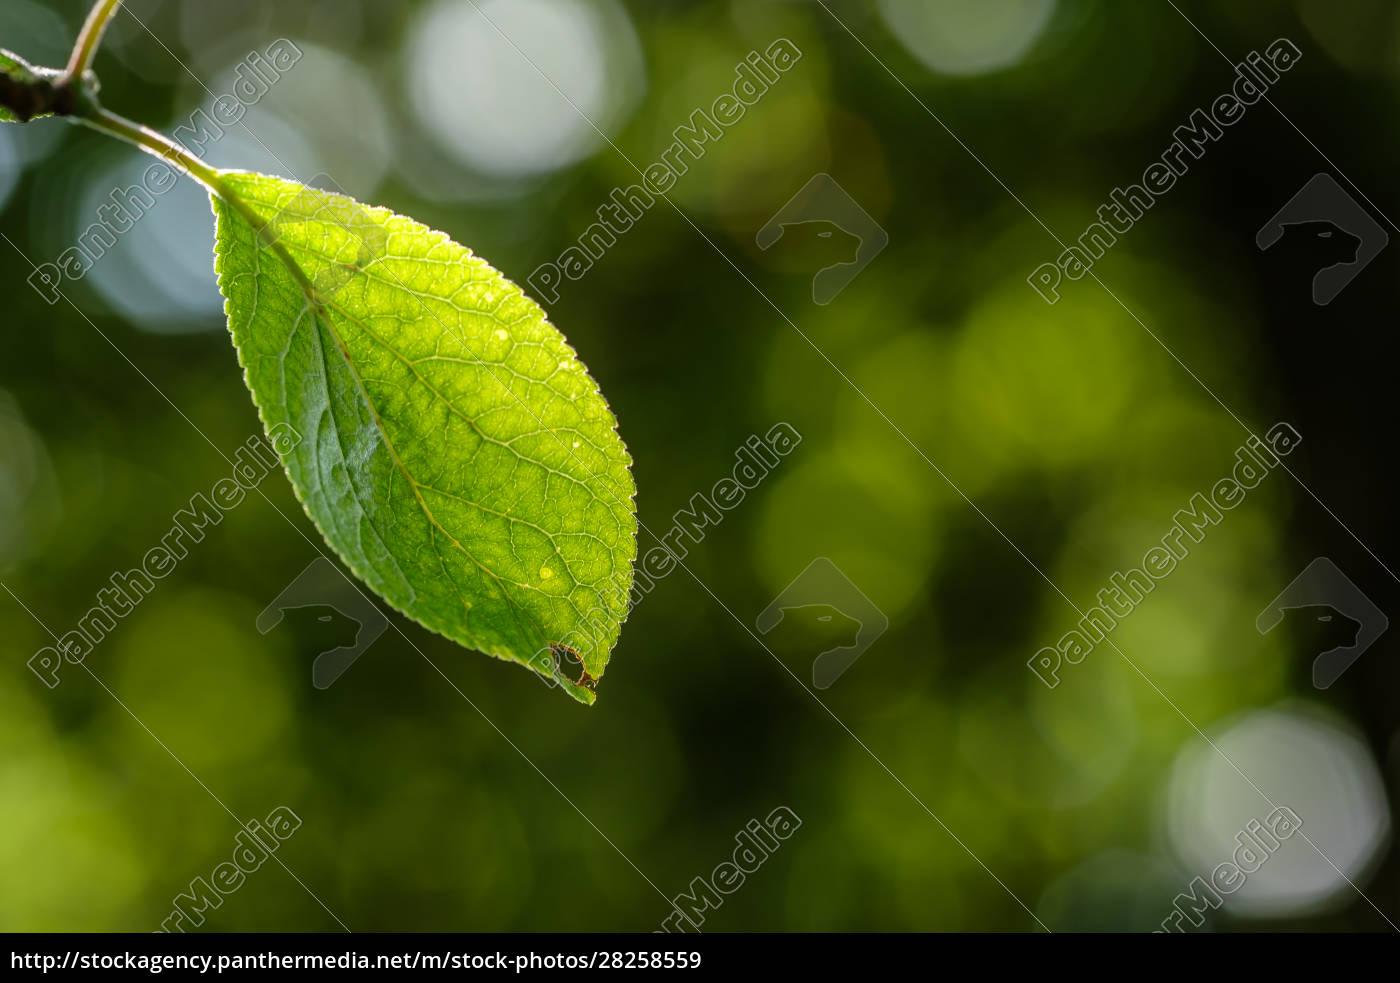 green, leaf, of, a, plum, tree - 28258559